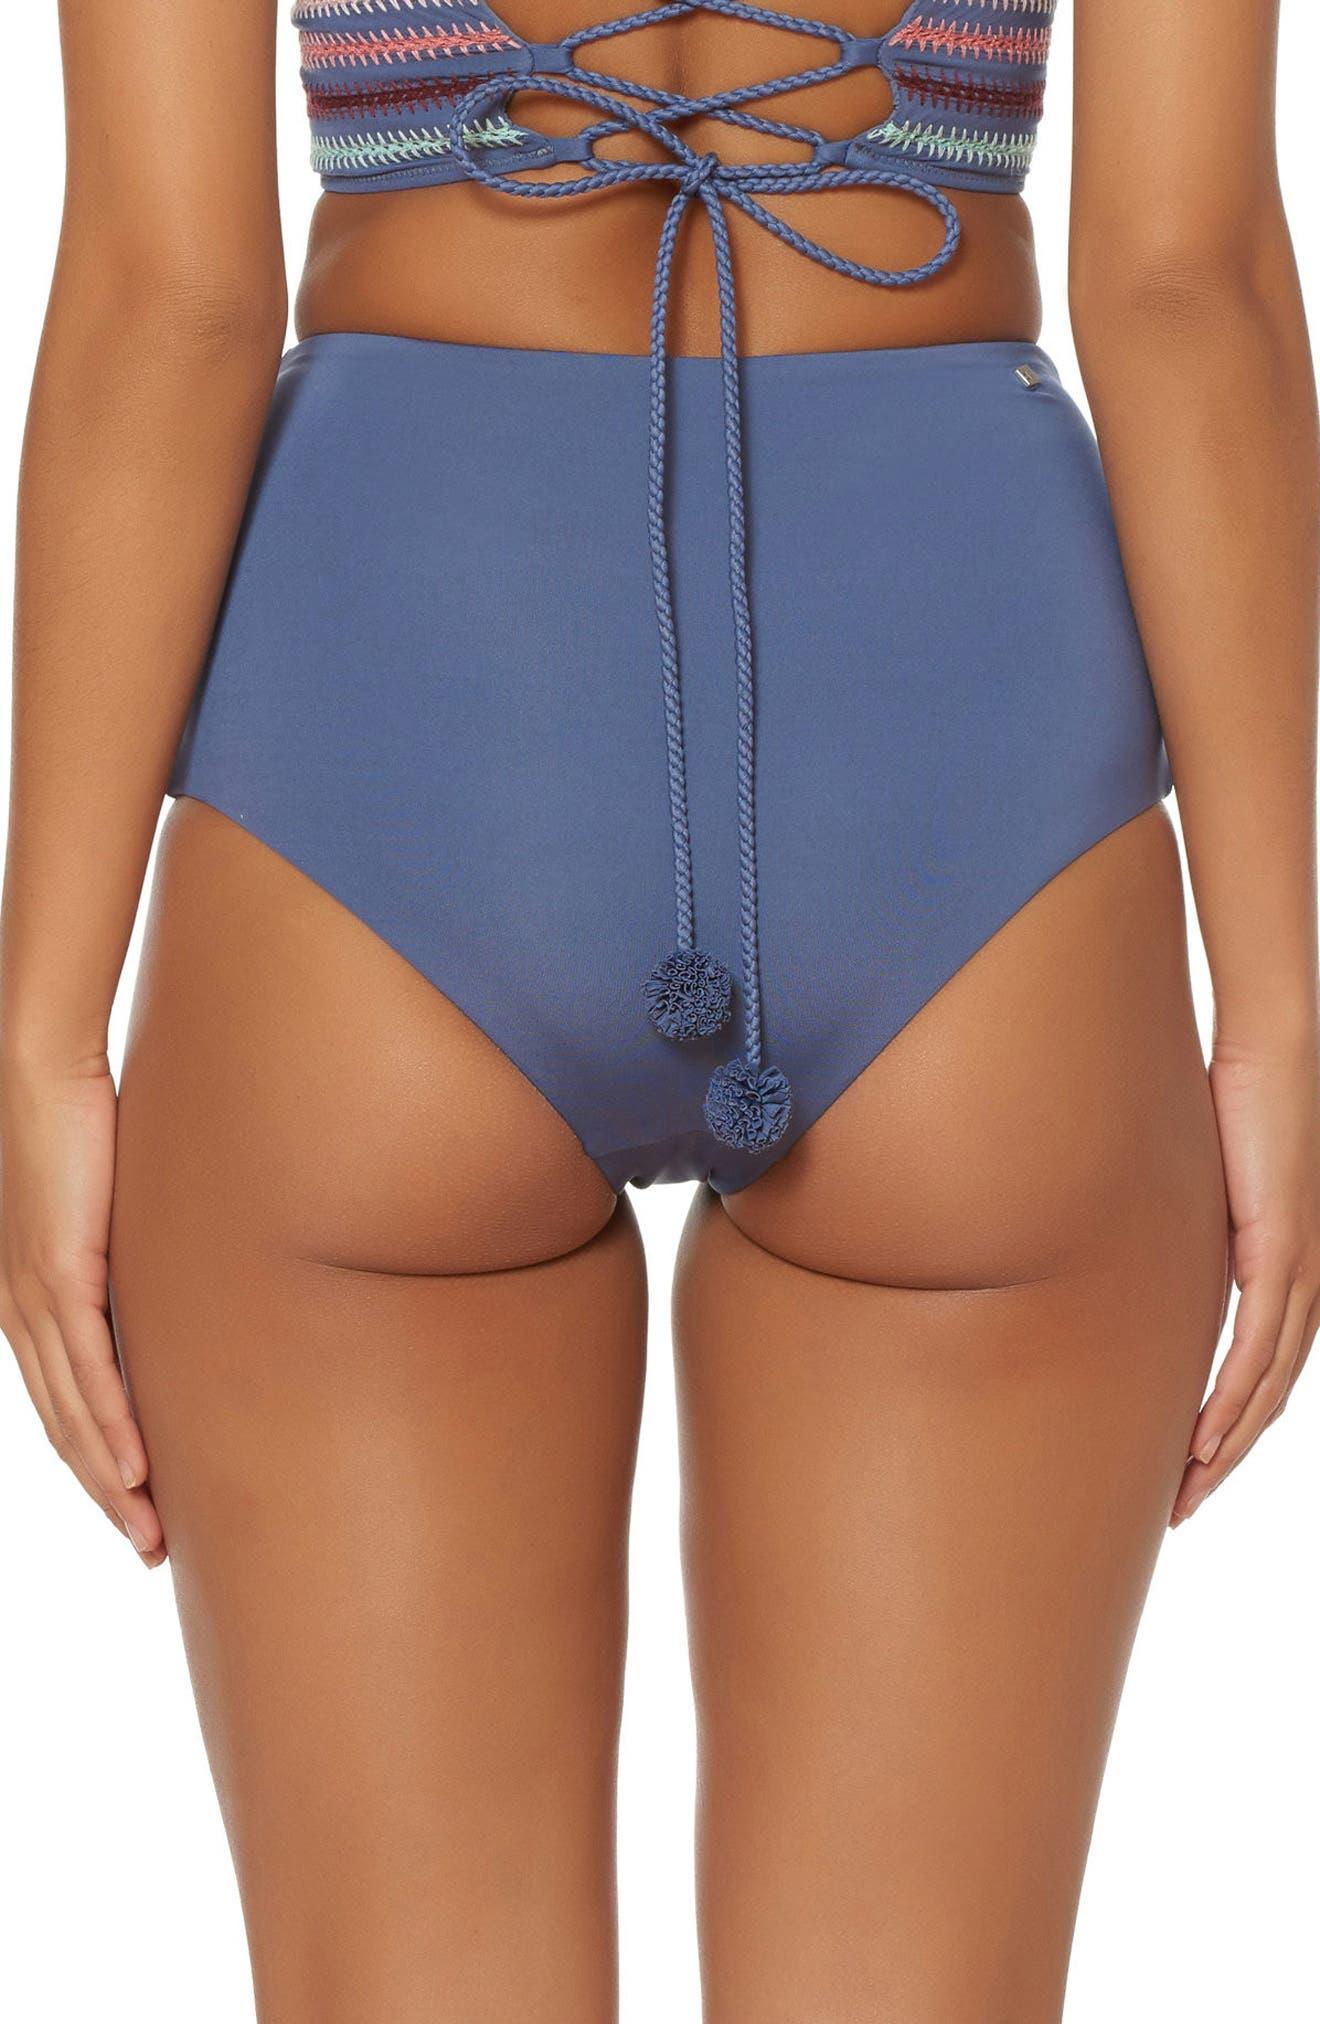 Embroidered High Waist Bikini Bottoms,                             Alternate thumbnail 3, color,